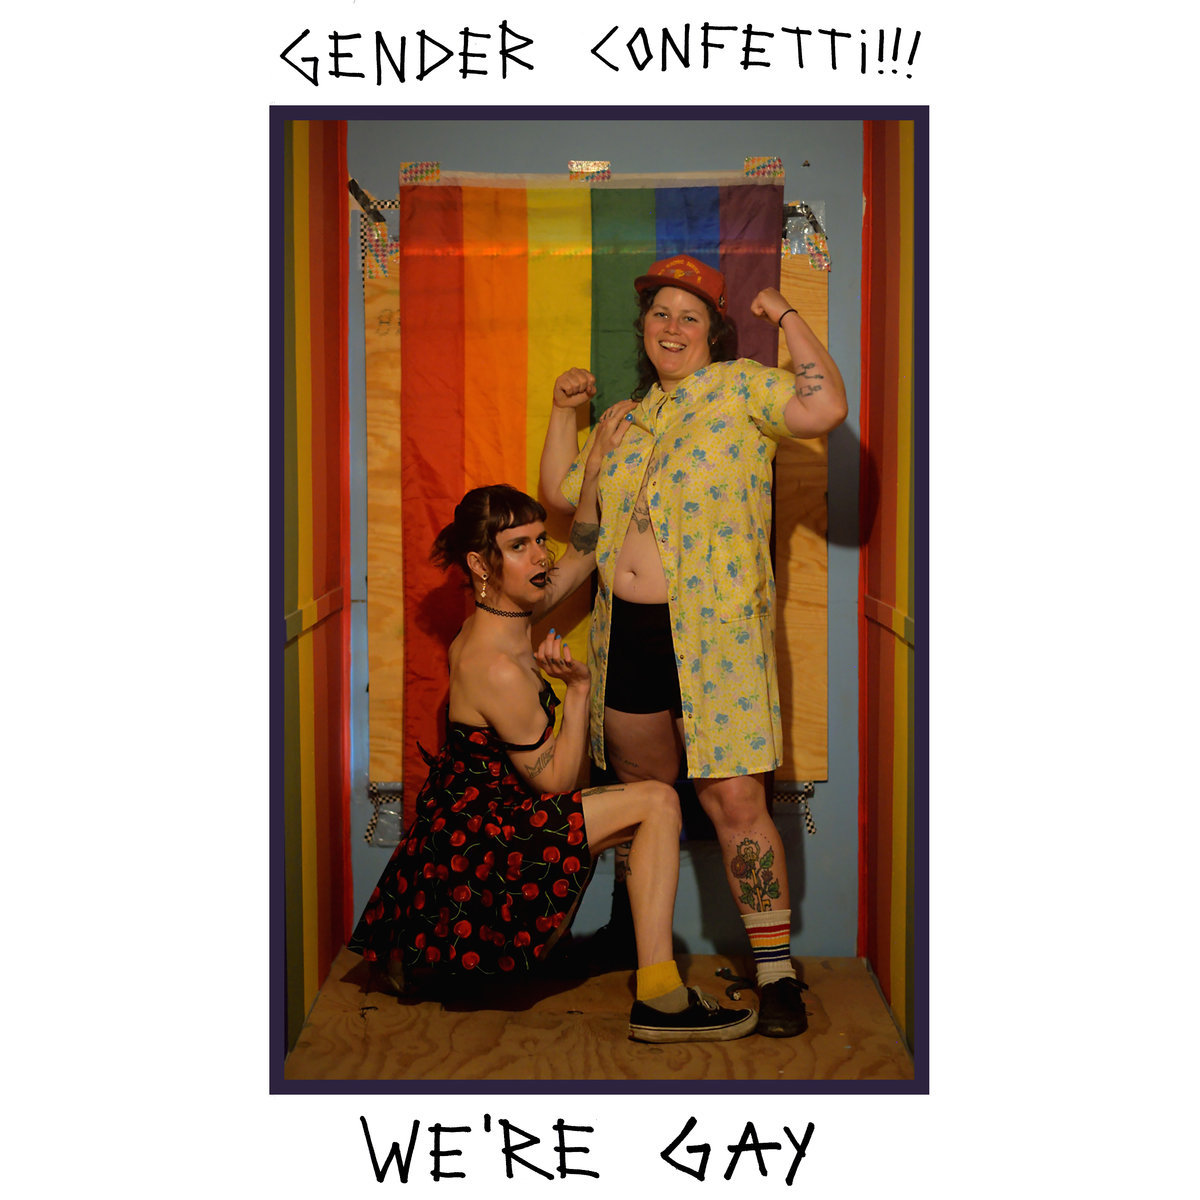 gender confetti.jpg